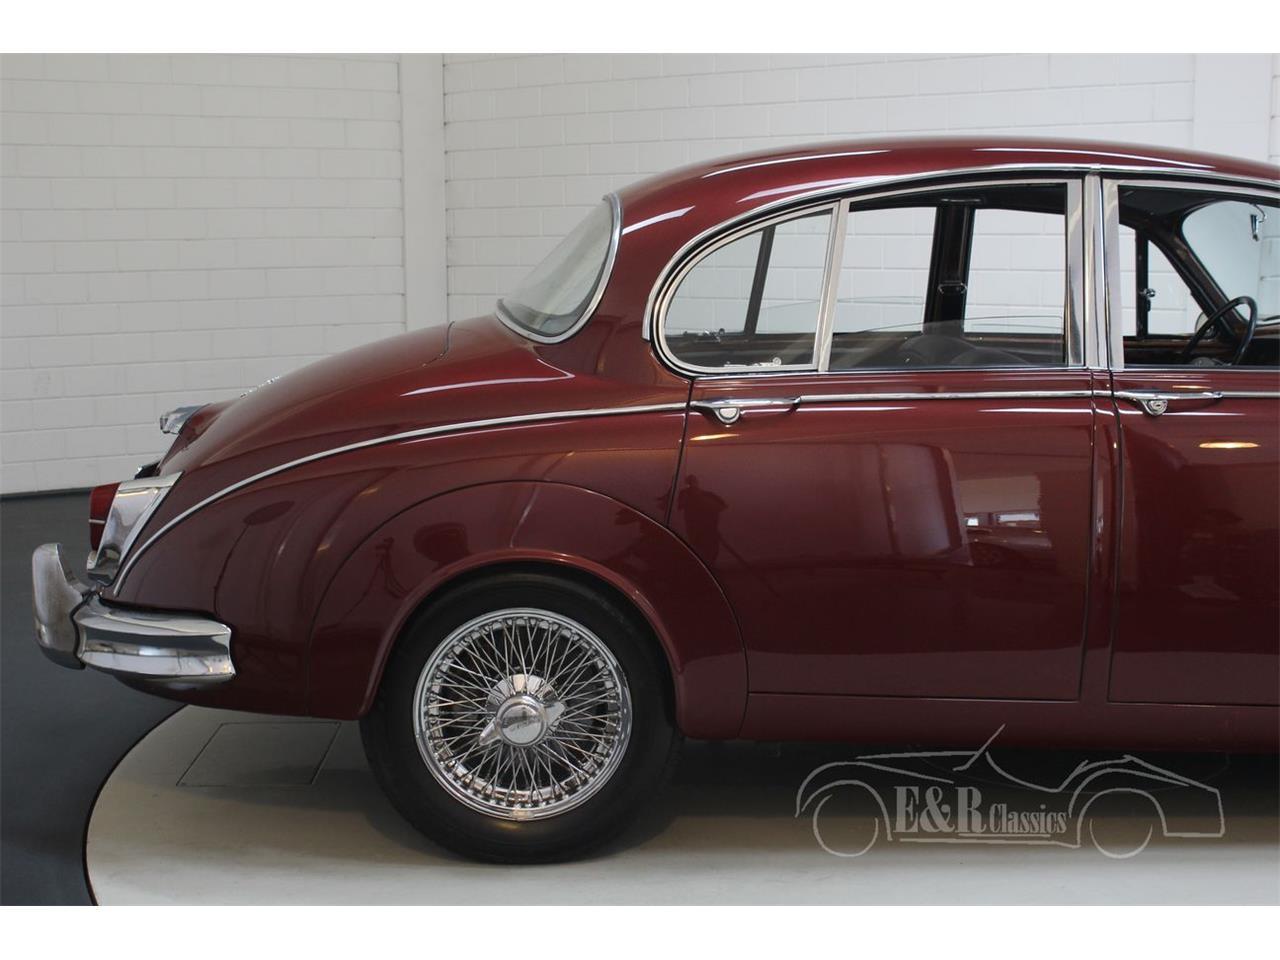 Large Picture of Classic '60 Jaguar Mark II located in Noord-Brabant - $48,200.00 - QJZJ